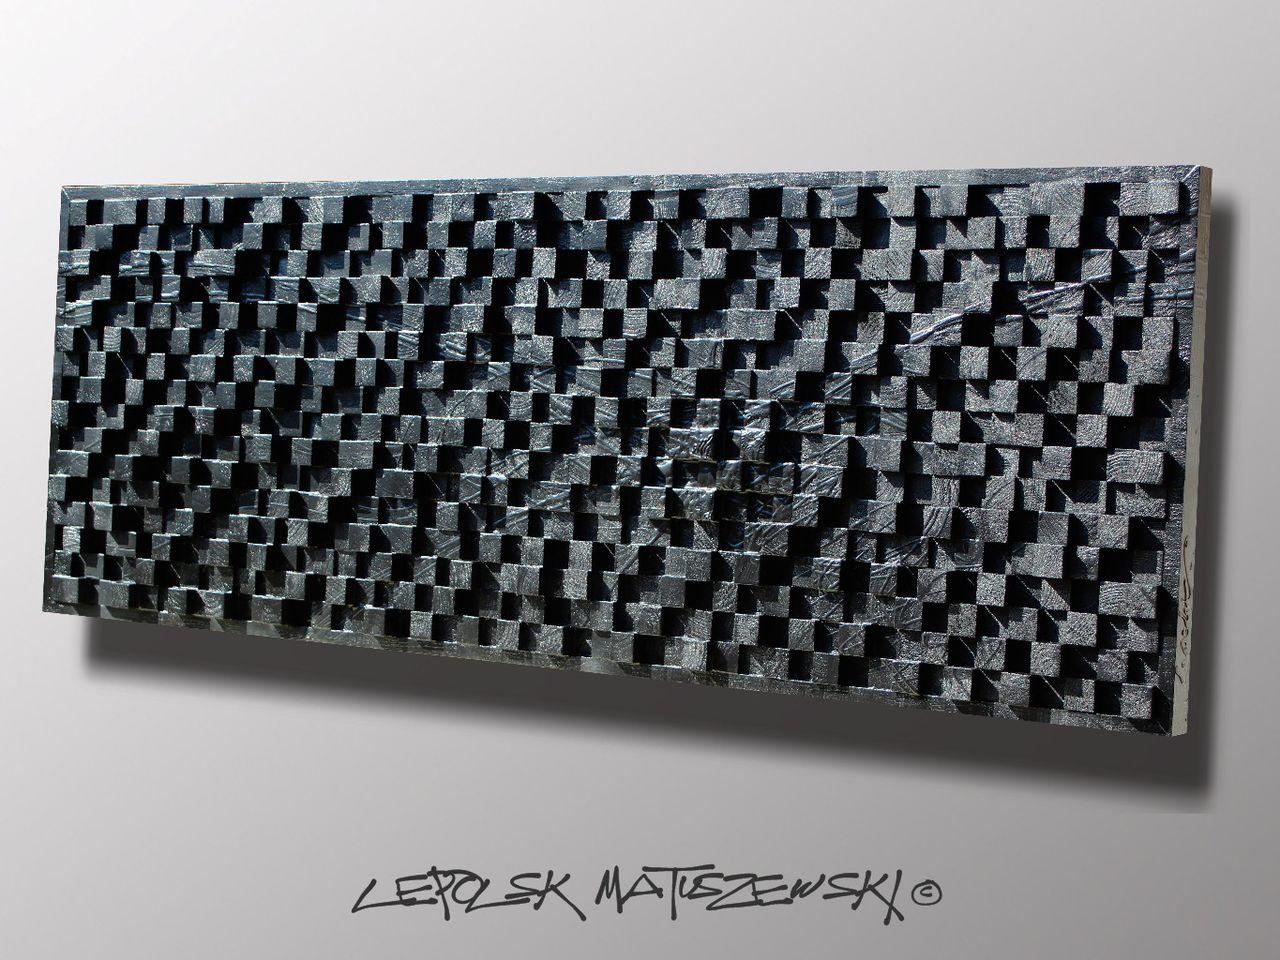 MK  Lepolsk Matuszewski PROTOTYPE 768³   expressionnisme abstrait